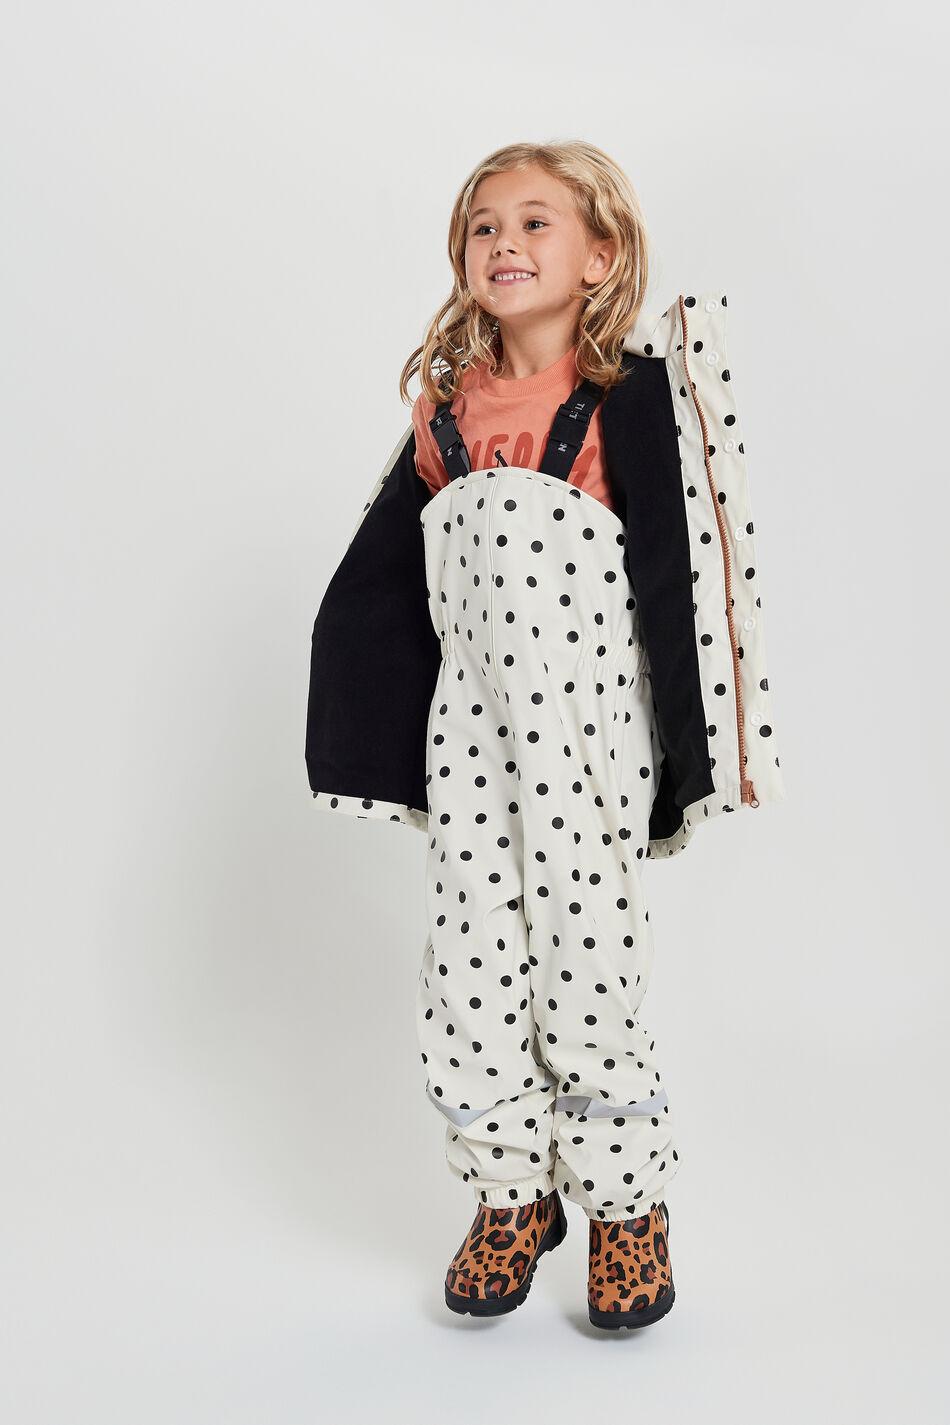 Gina Tricot Tretorn mini rain pants 98/104 Female Dots (9114)